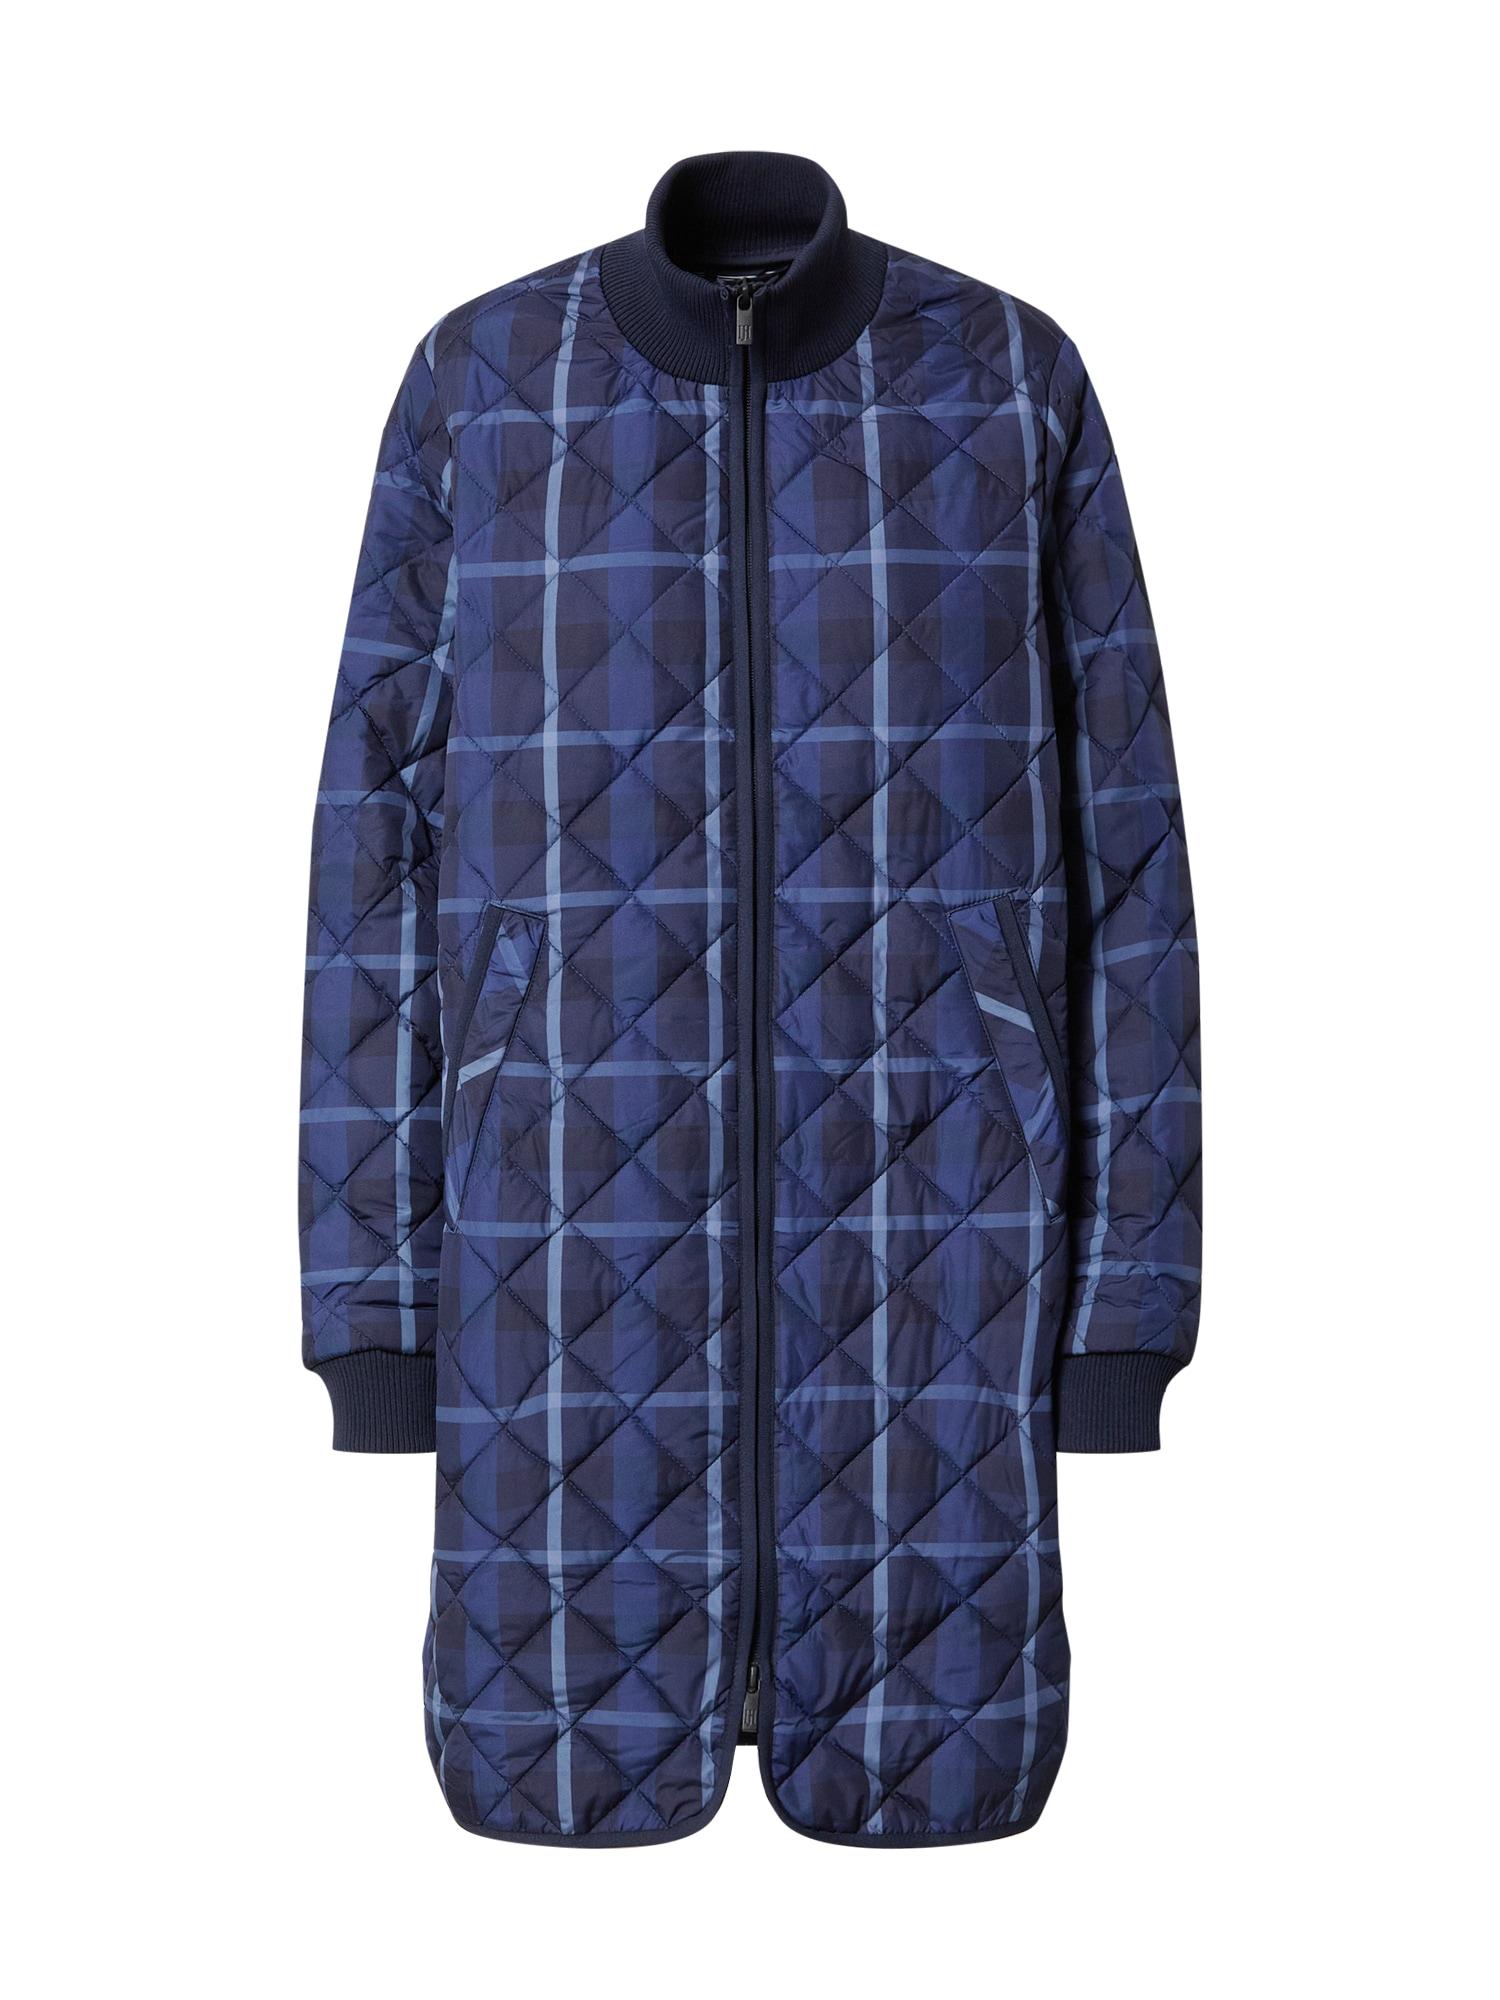 ILSE JACOBSEN Demisezoninis paltas tamsiai mėlyna / šviesiai mėlyna